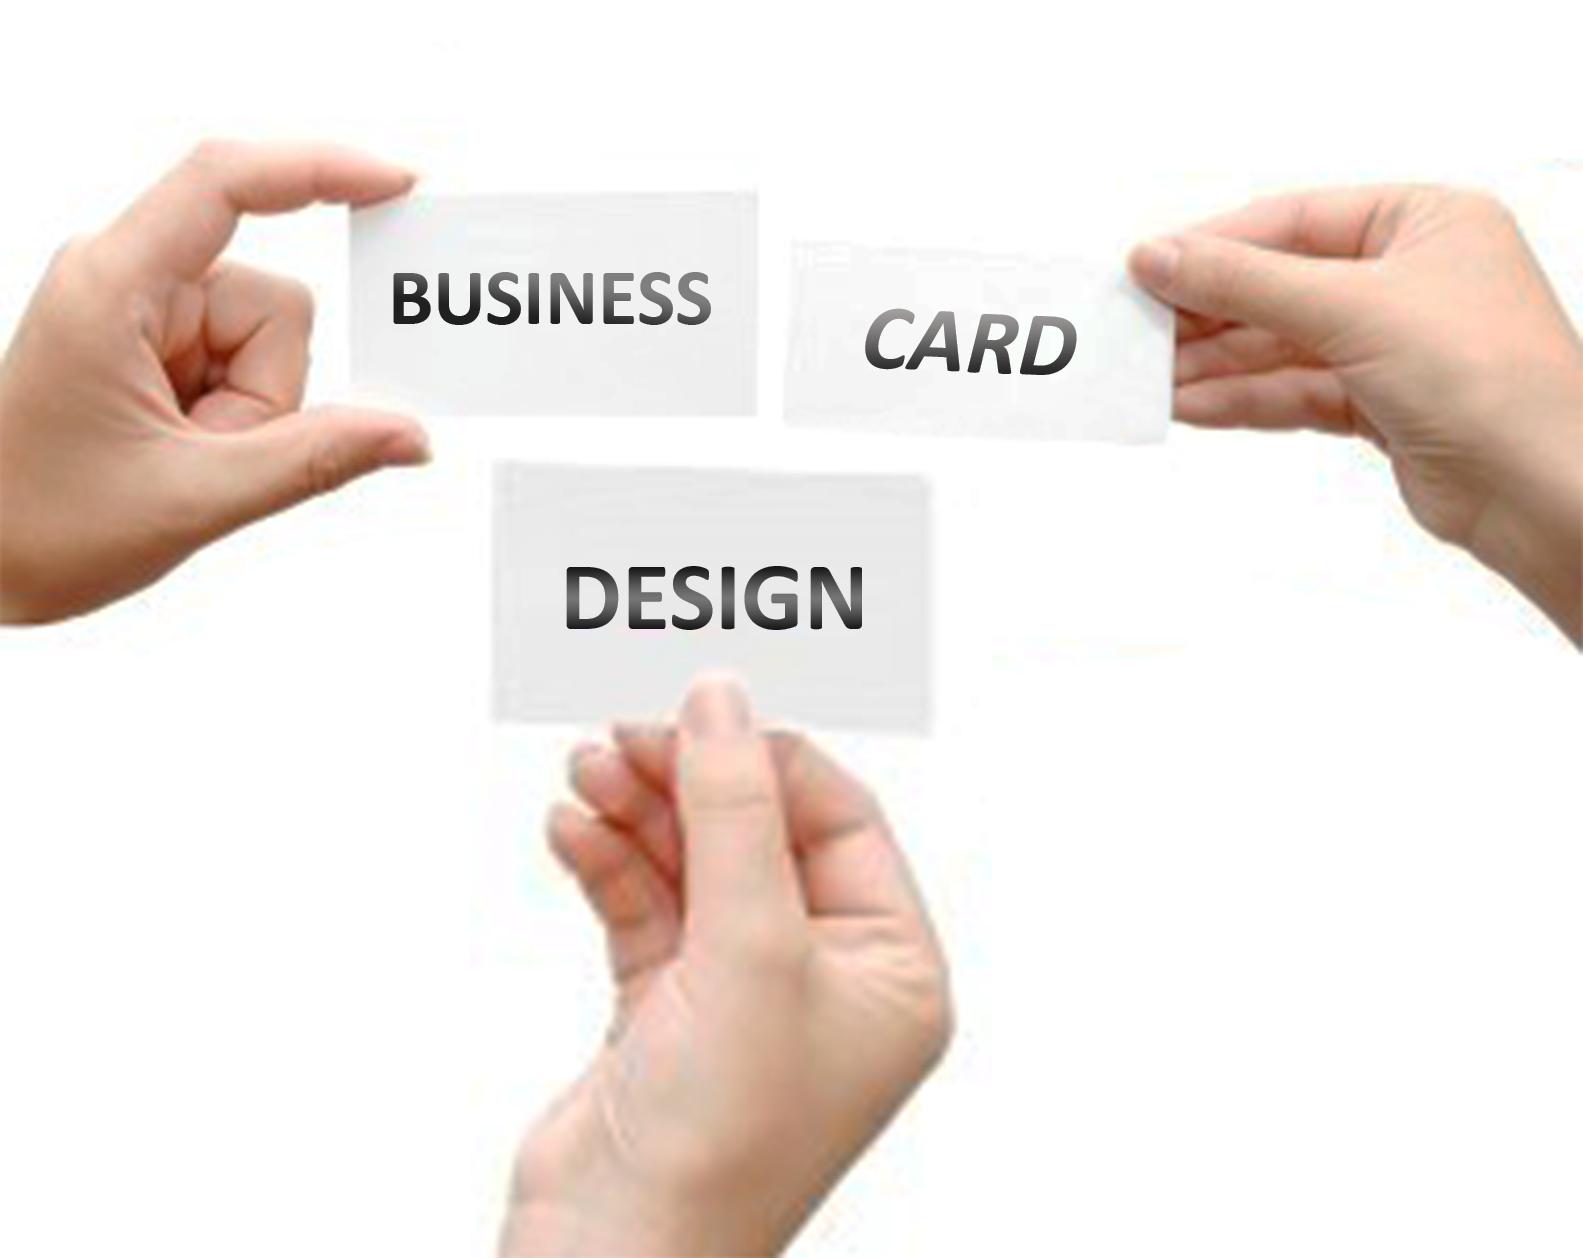 Business Card Design Company in Thane | Mumbai - Infiyug Technologies